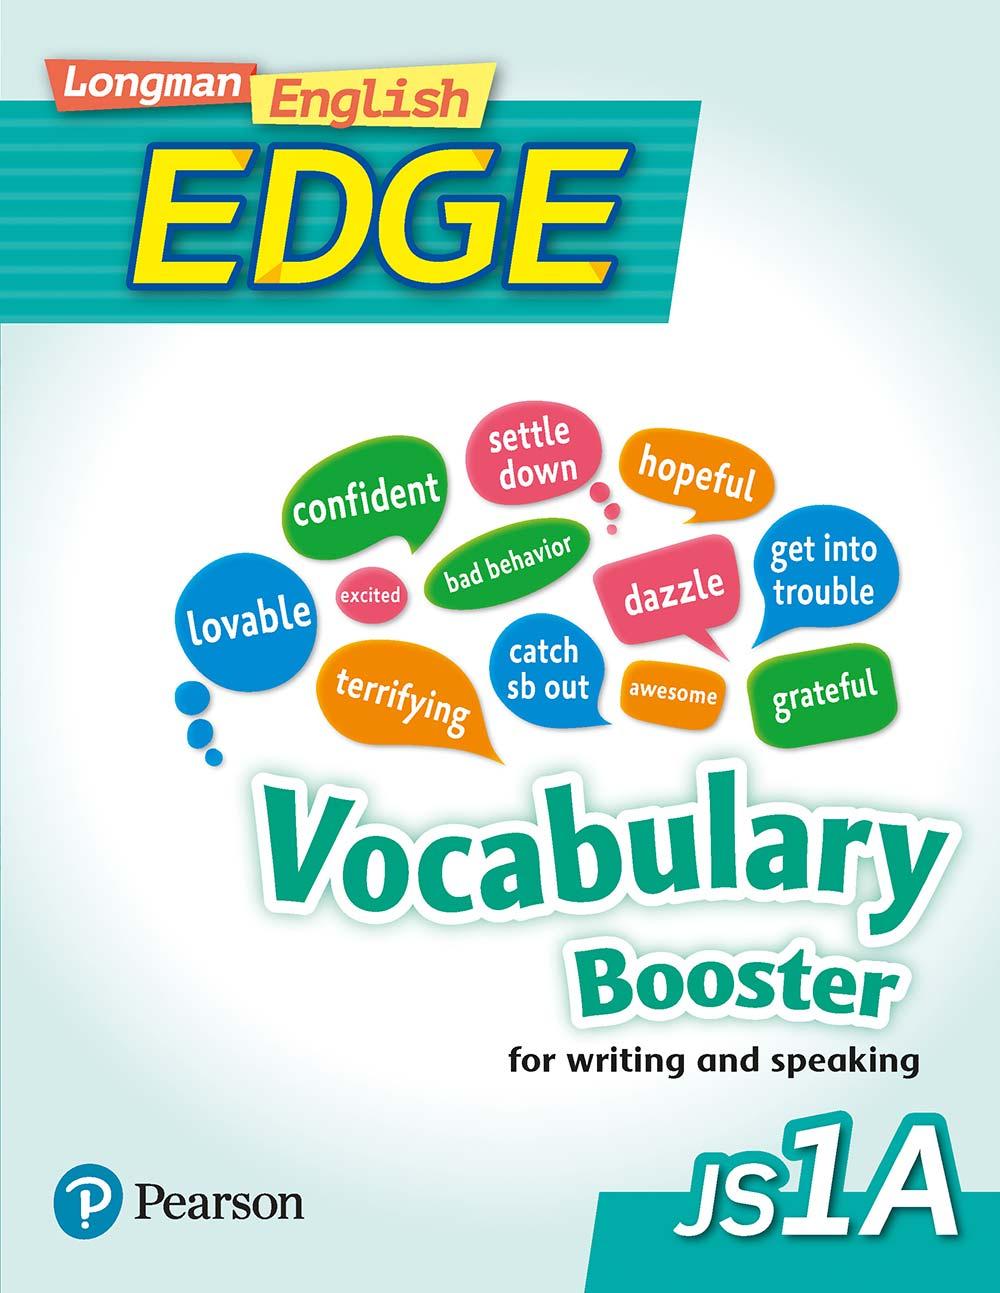 Longman English Edge JS1A Vocabulary Booster